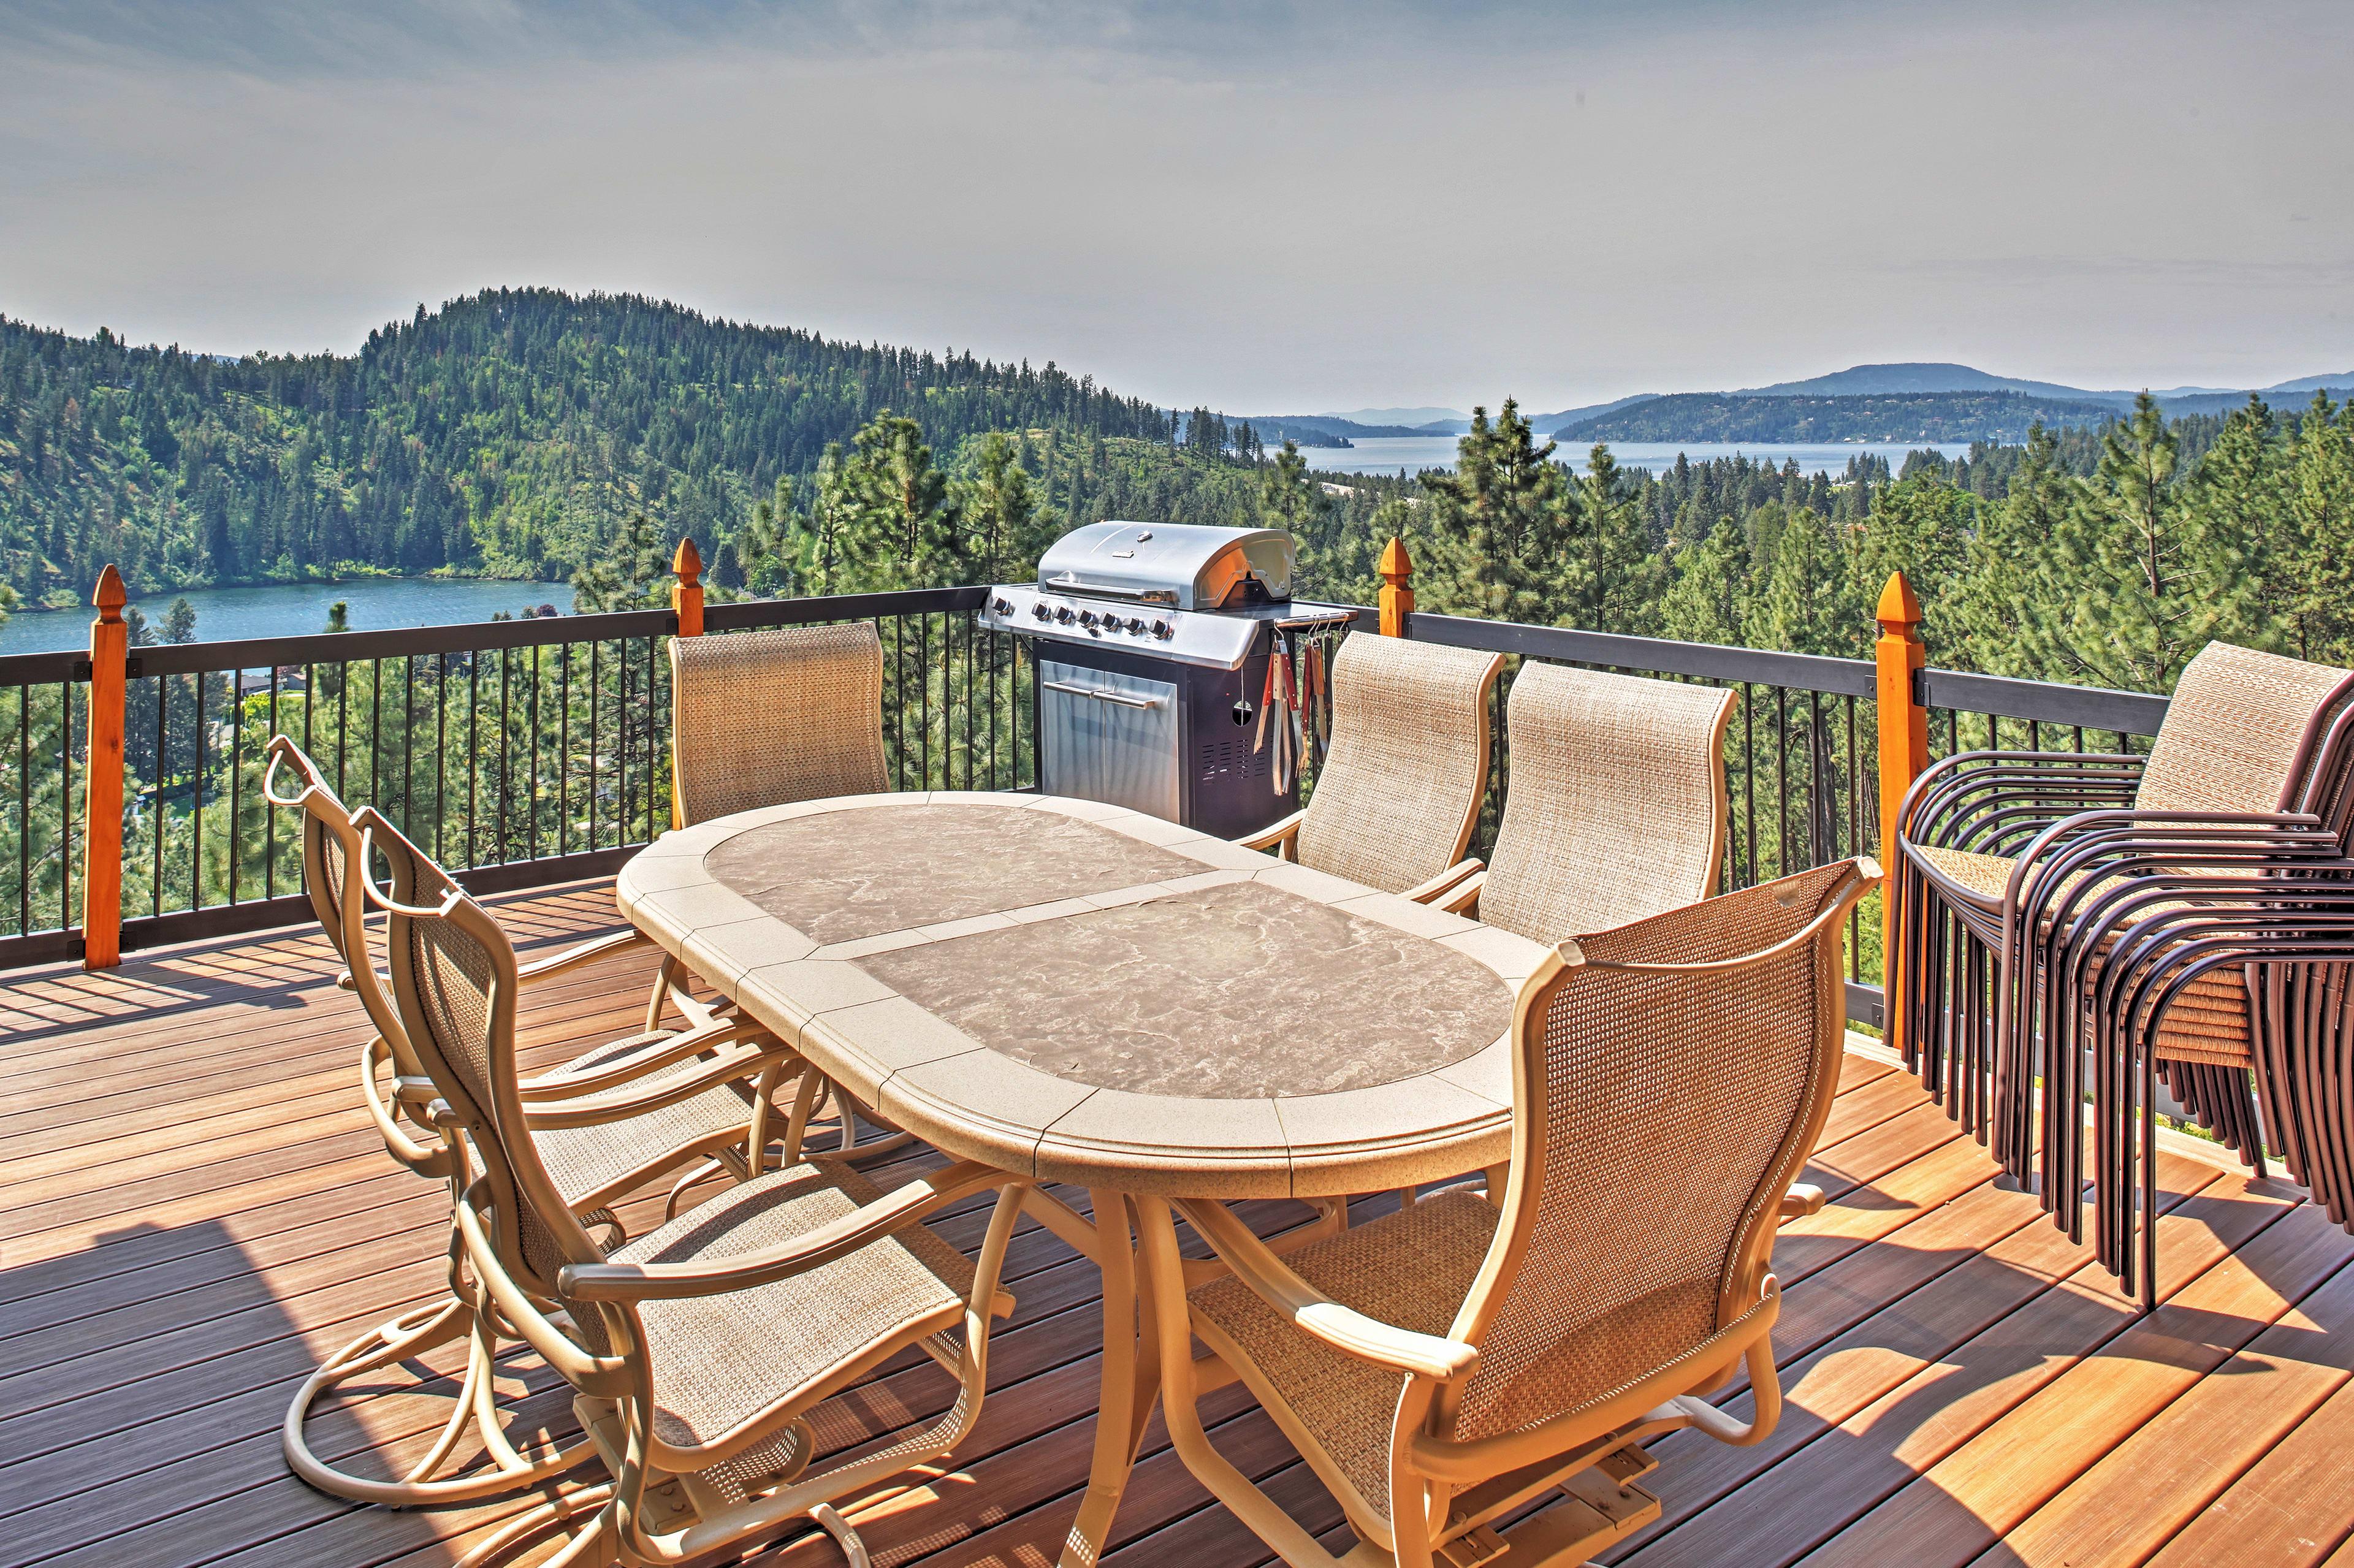 The 300-square-foot deck overlooks Lake Coeur d'Alene & Fernan Lake.